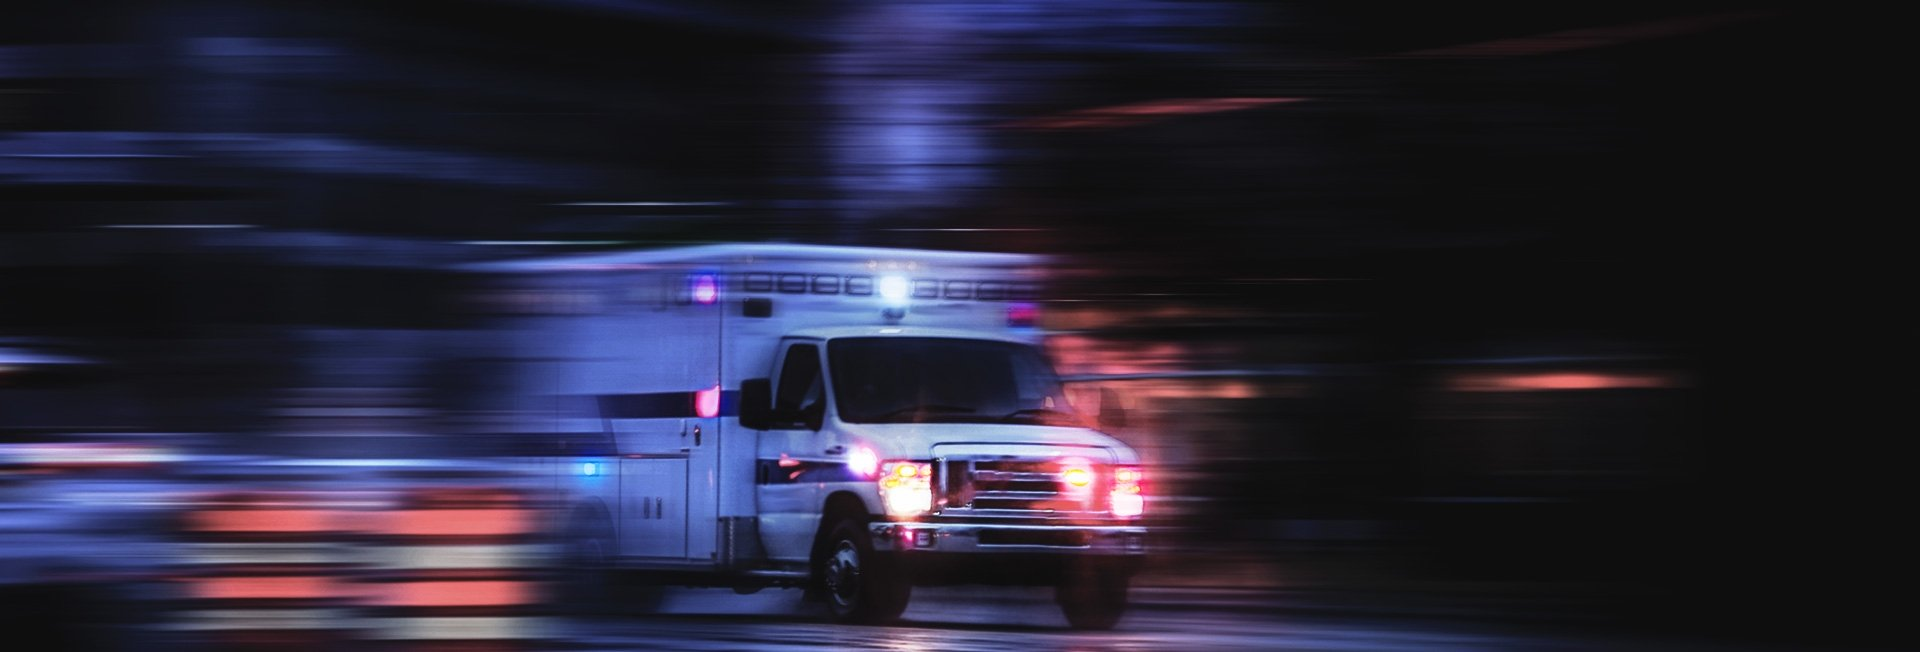 Ambulance/1st Responders